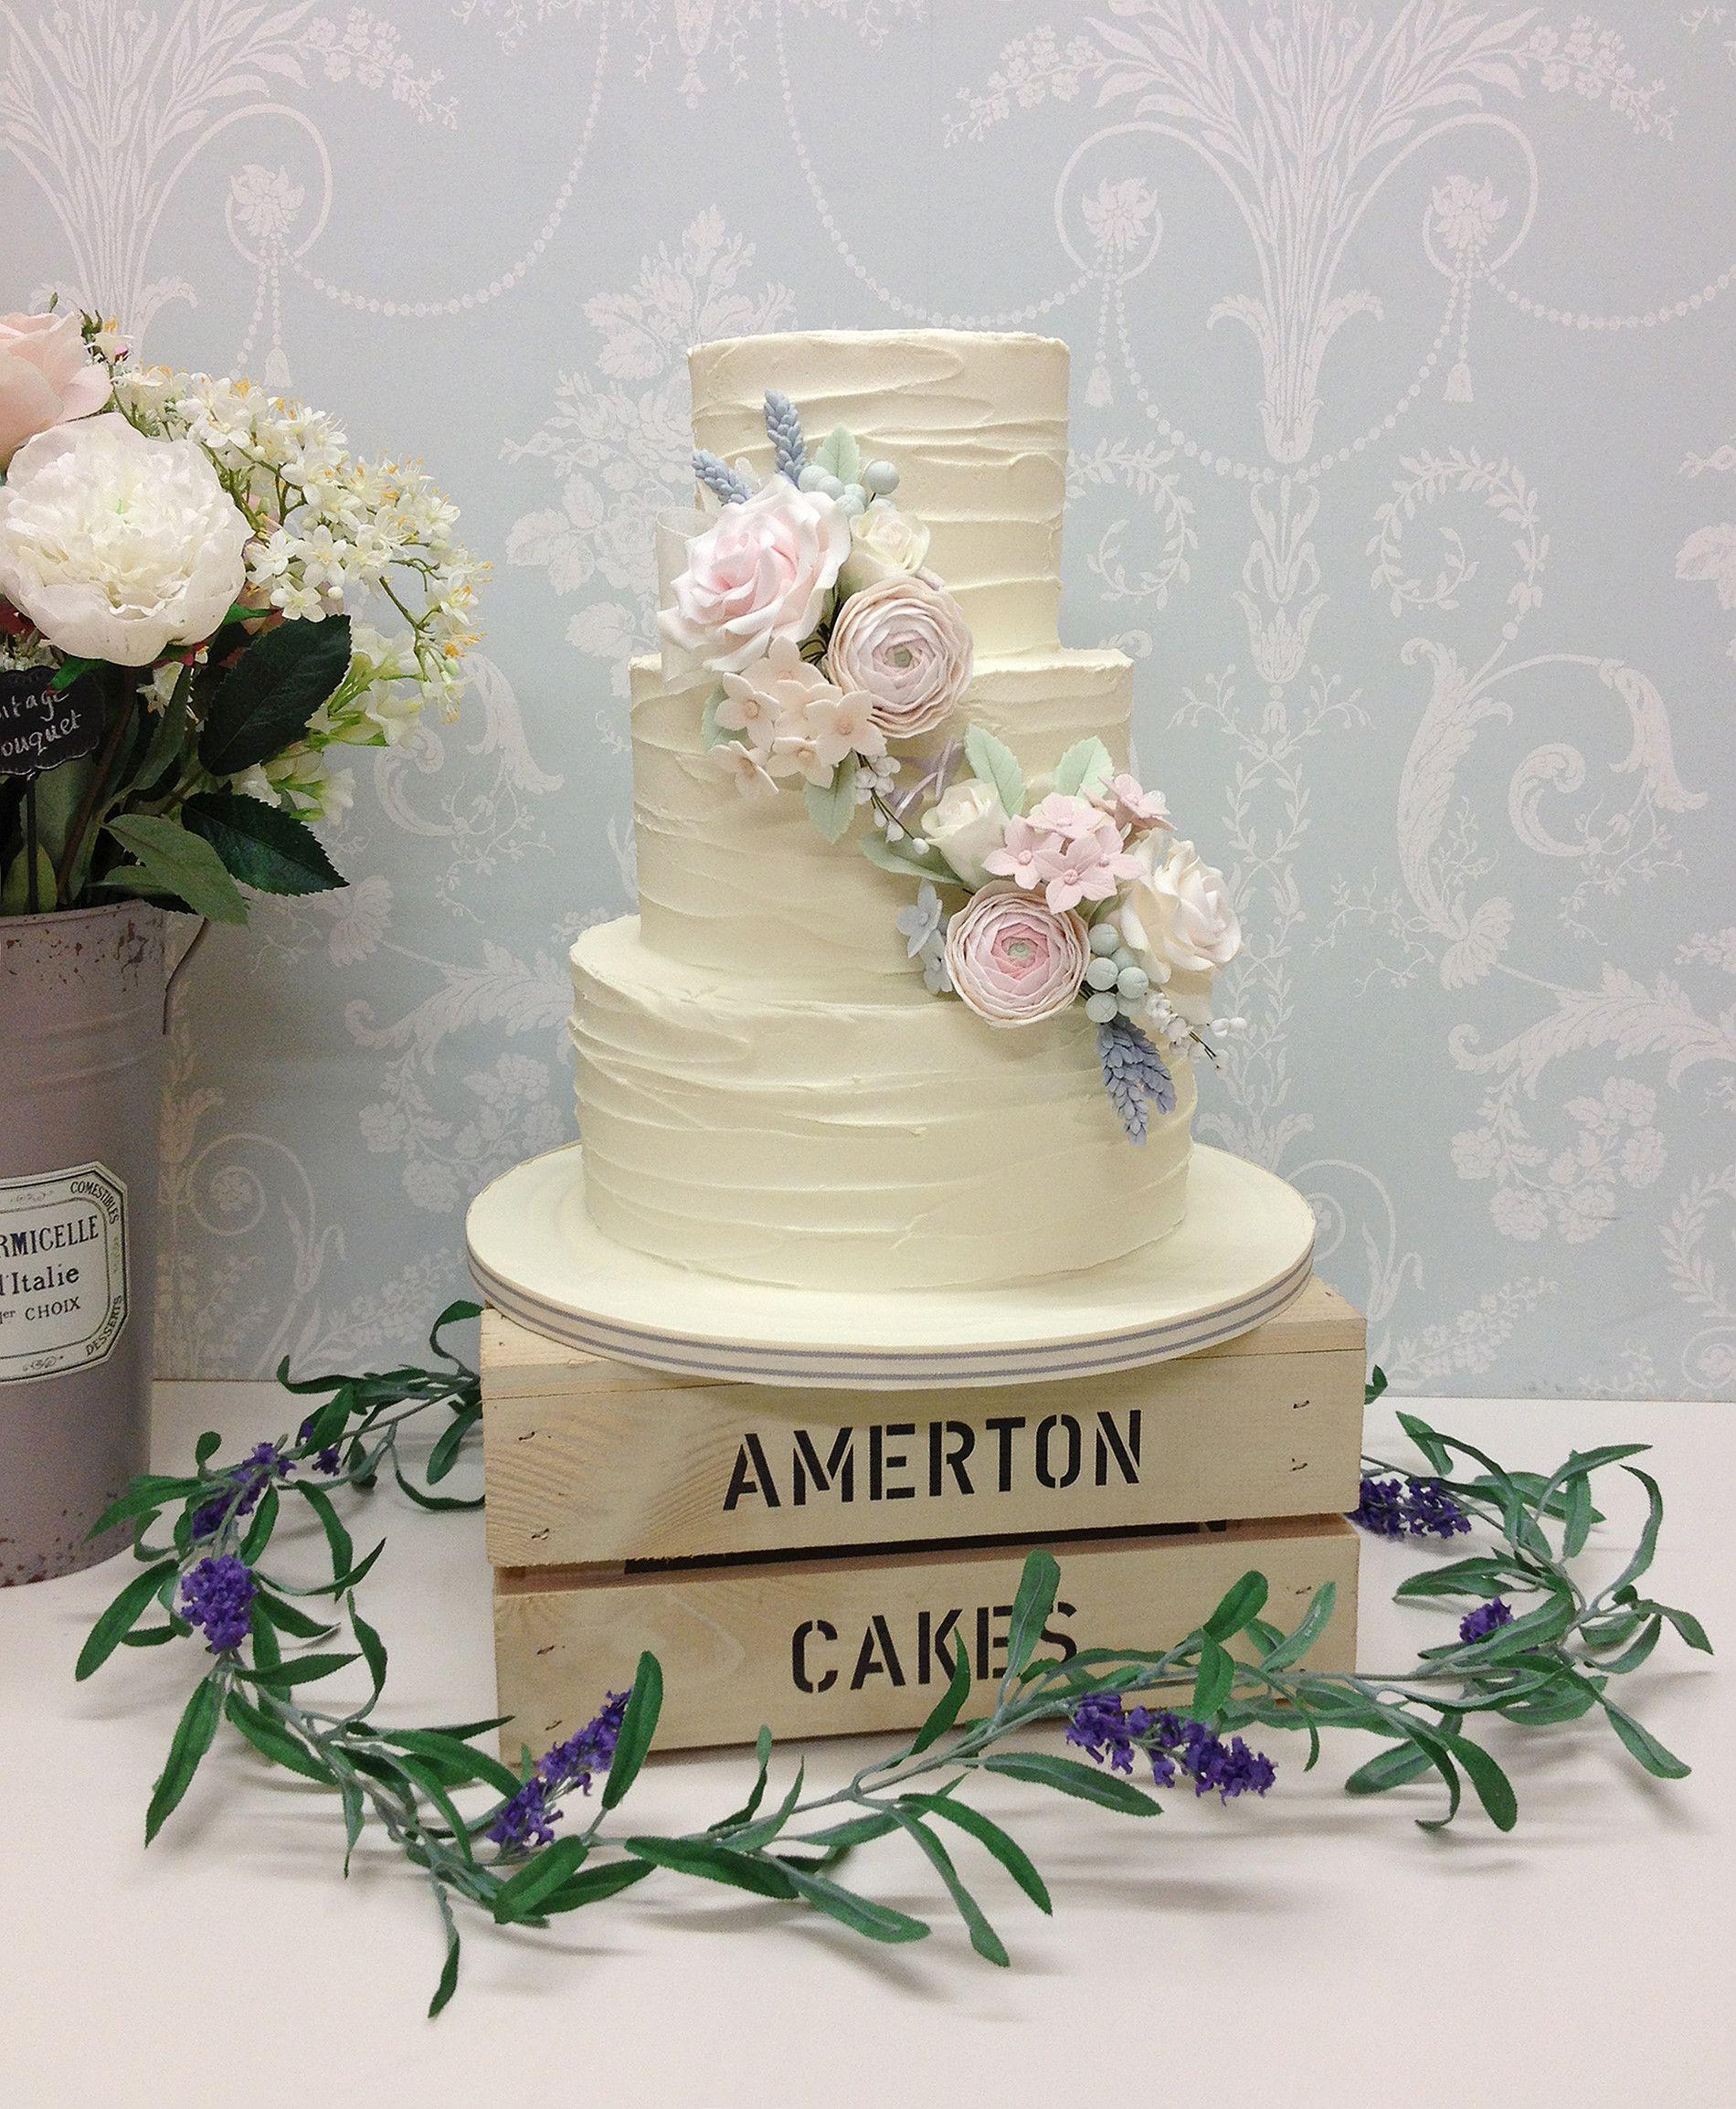 wedding cakes staffordshire - 5000+ Simple Wedding Cakes